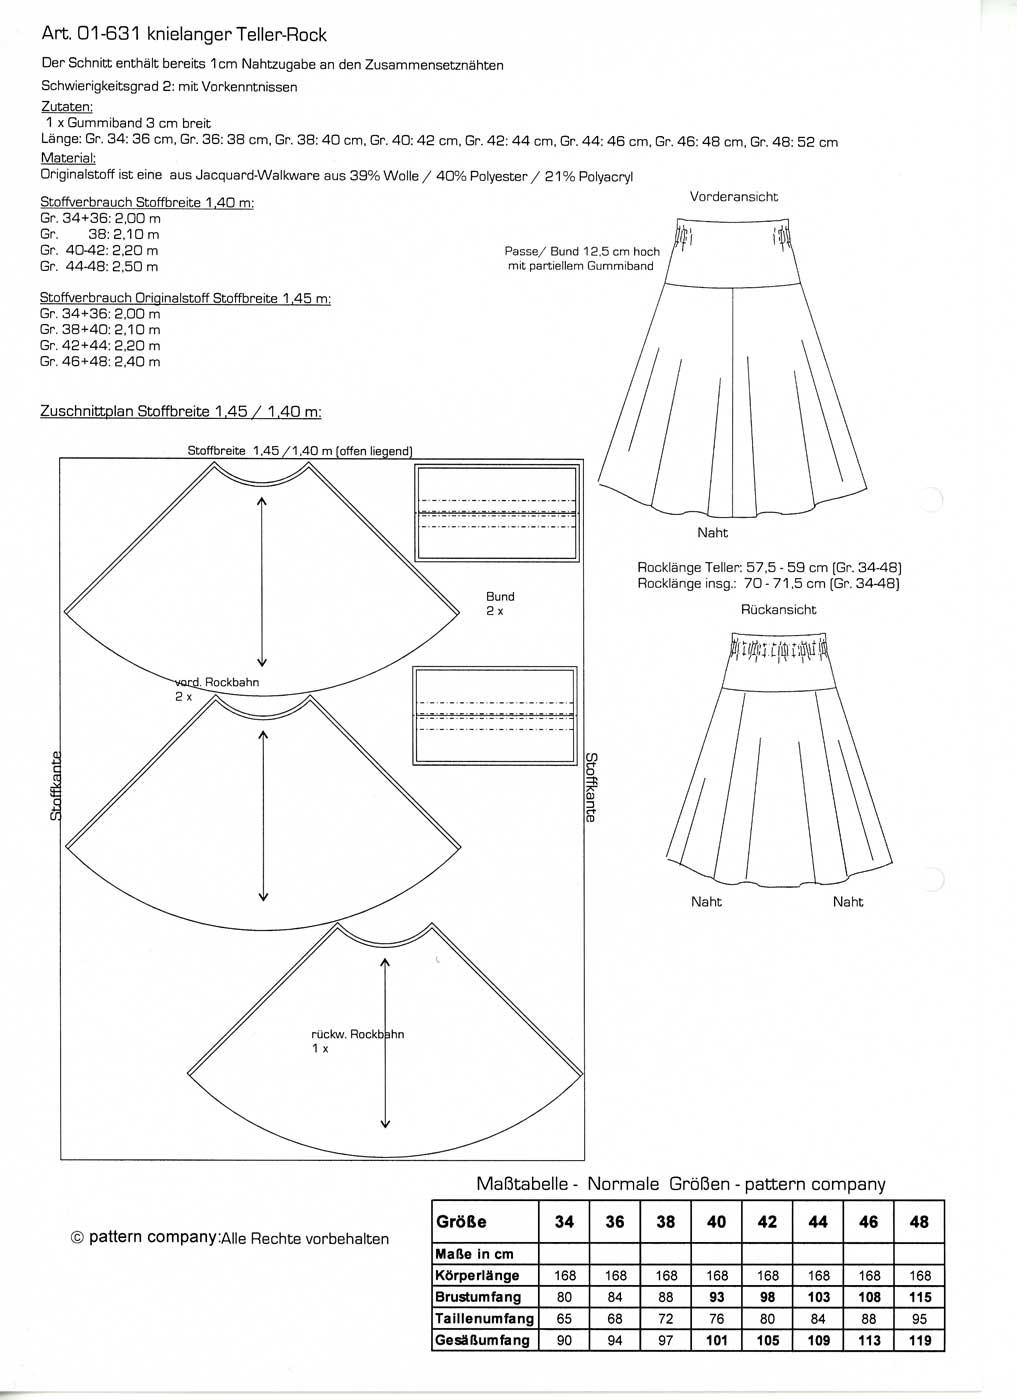 Schnittmuster - Teller-Rock - 01-631 - Pattern Company